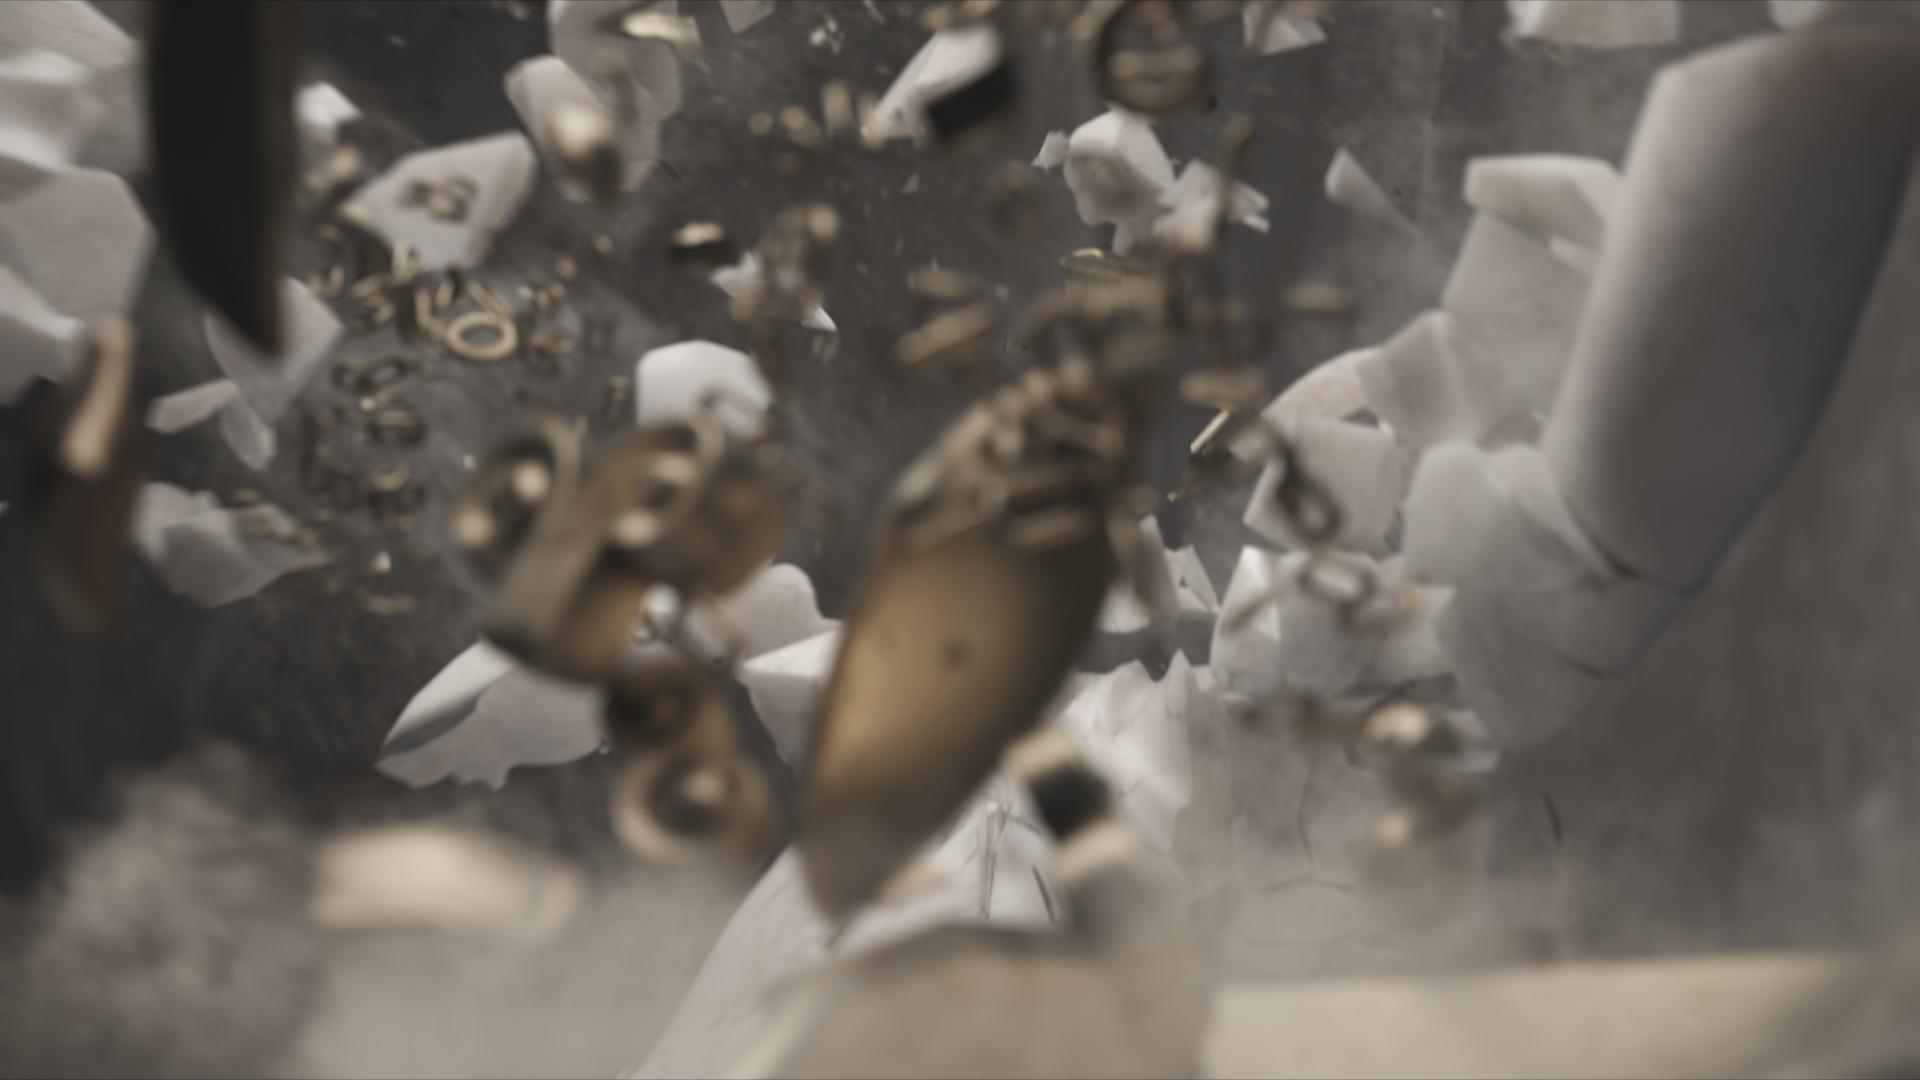 serie-traicion-tve-animacion-3d-explosion-escultura-6-1920x1080-1.jpg